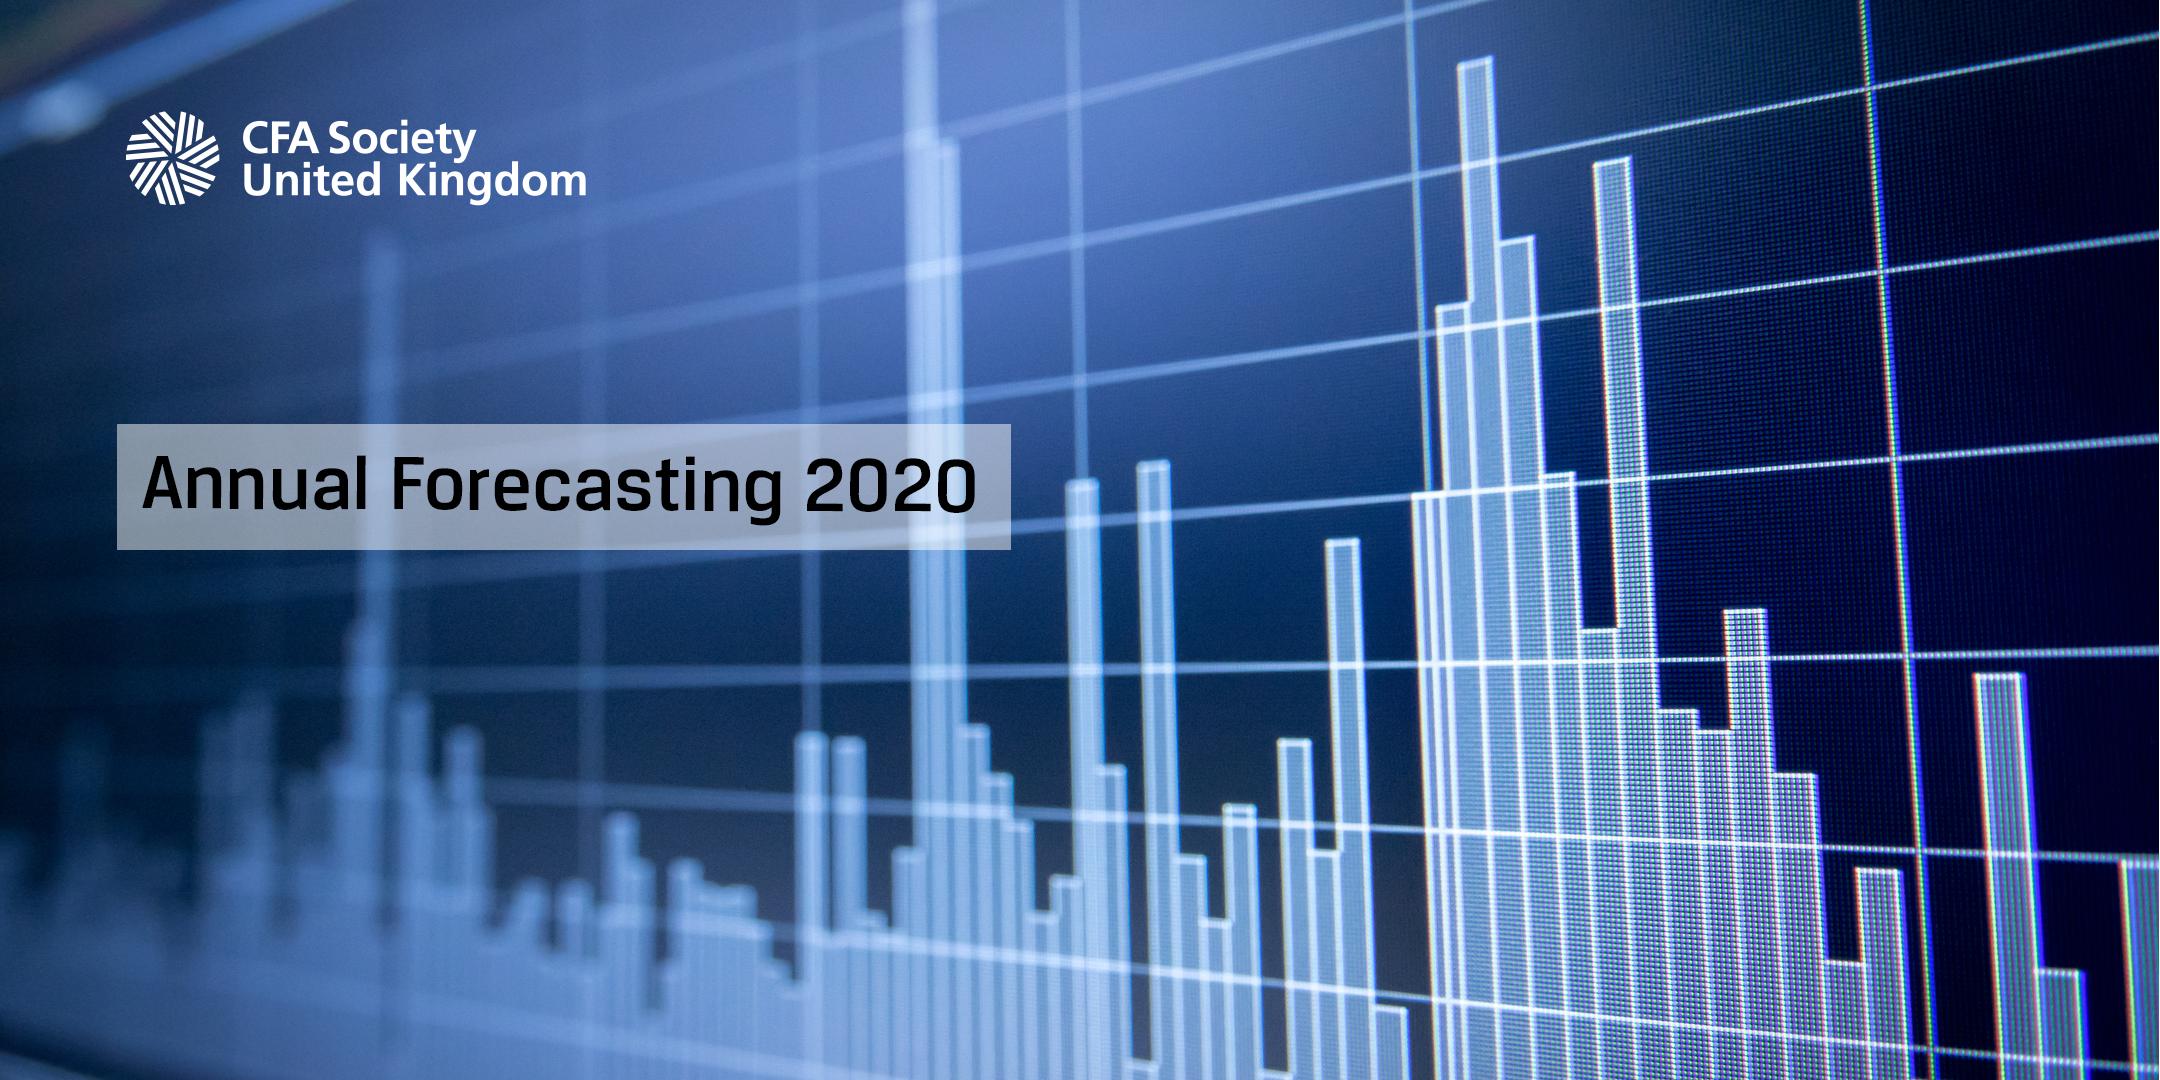 Annual Forecasting 2020